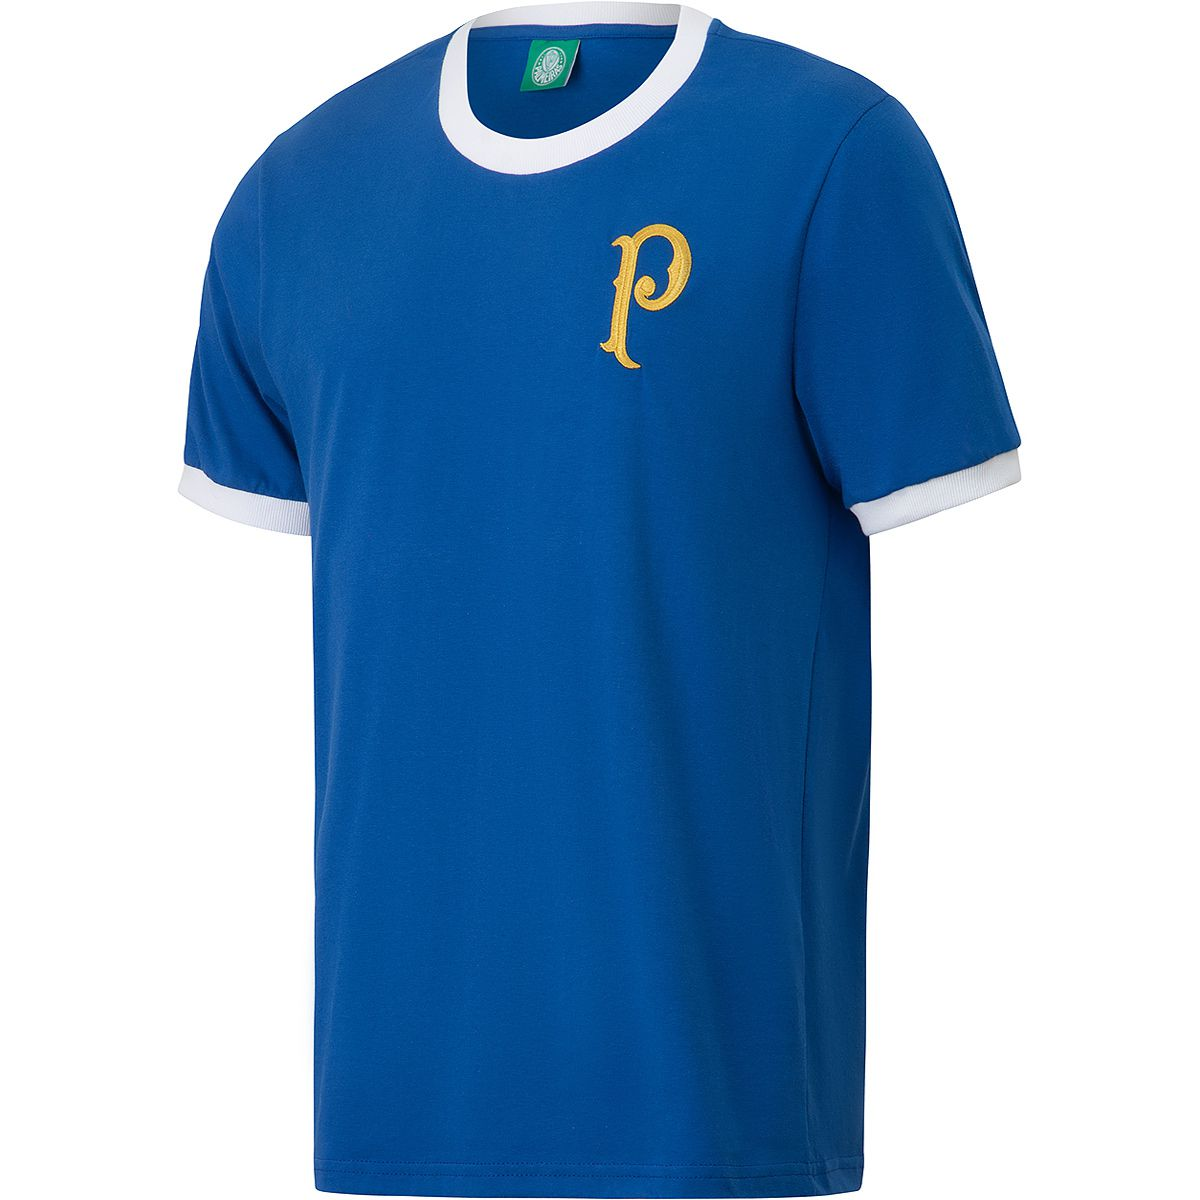 Camisa Palmeiras Vintage Torcedor Masculina